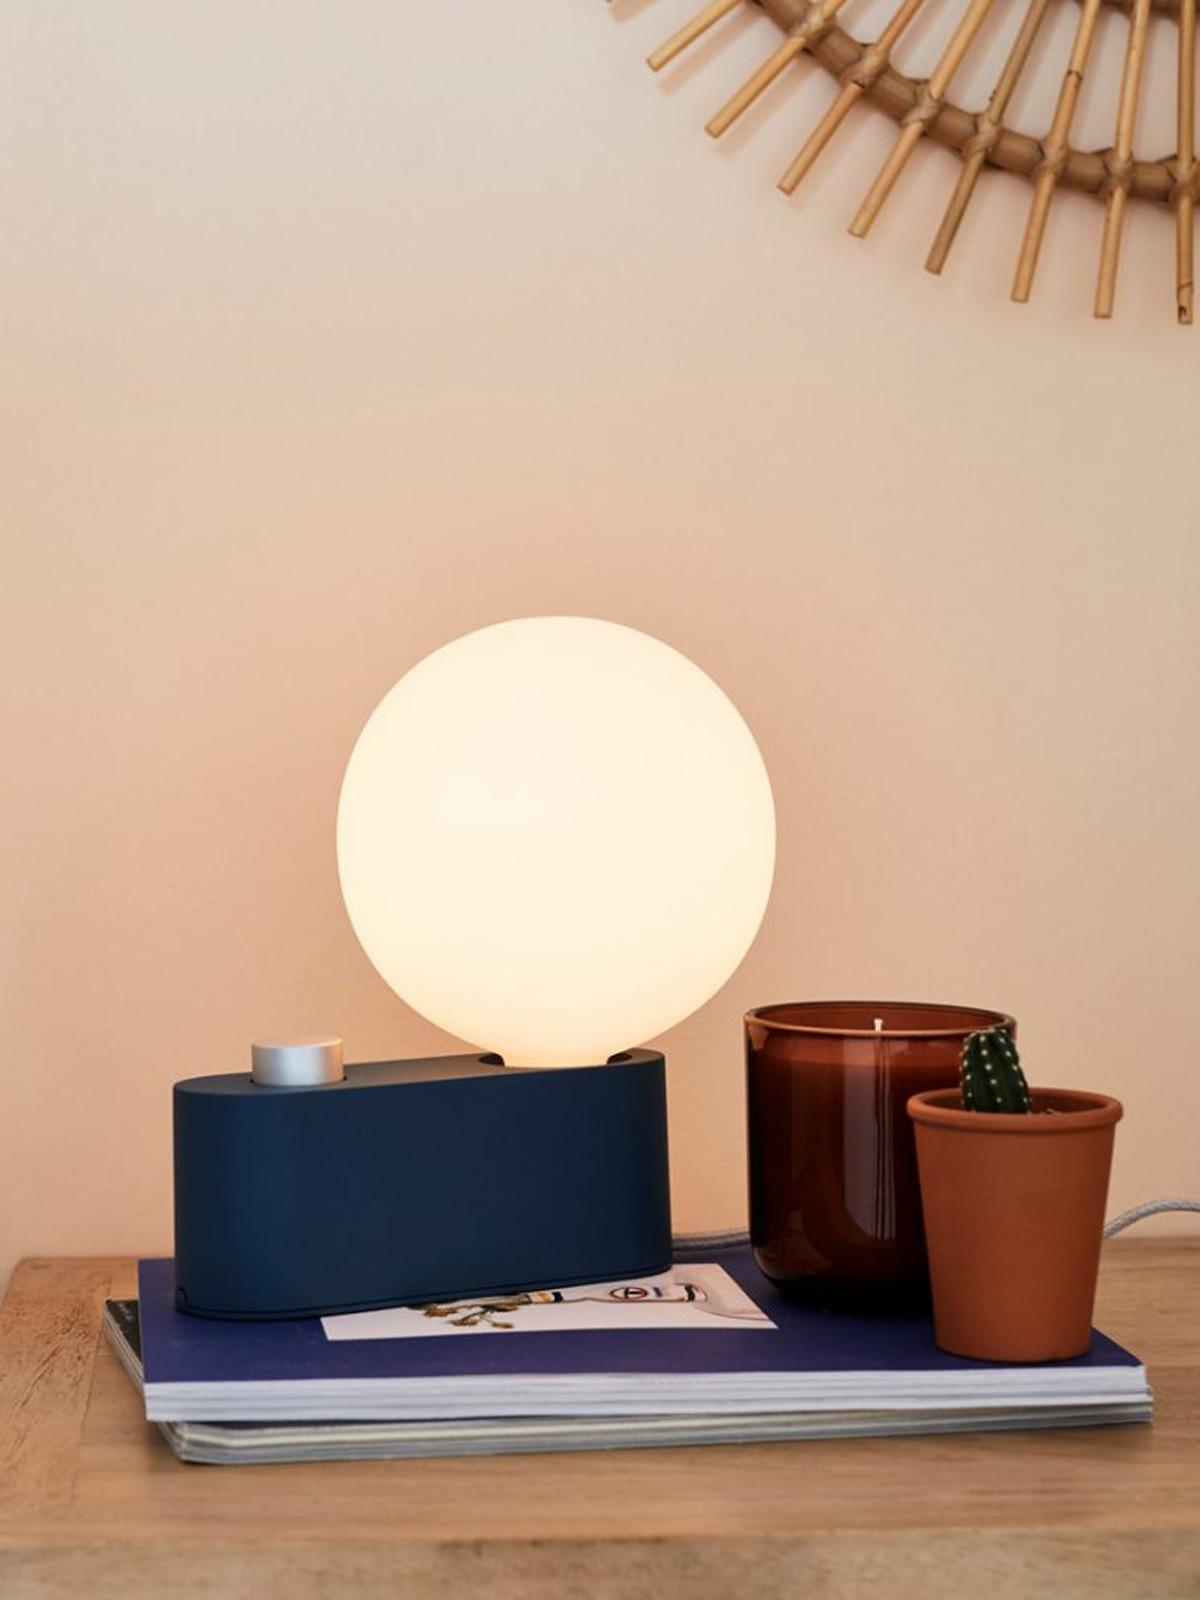 DesignOrt Lampenblog: Farbtrends 2021 Tala Alumina Tischlampe mit mundgeblasenem Leuchtmittel DesignOrt Lampen Berlin